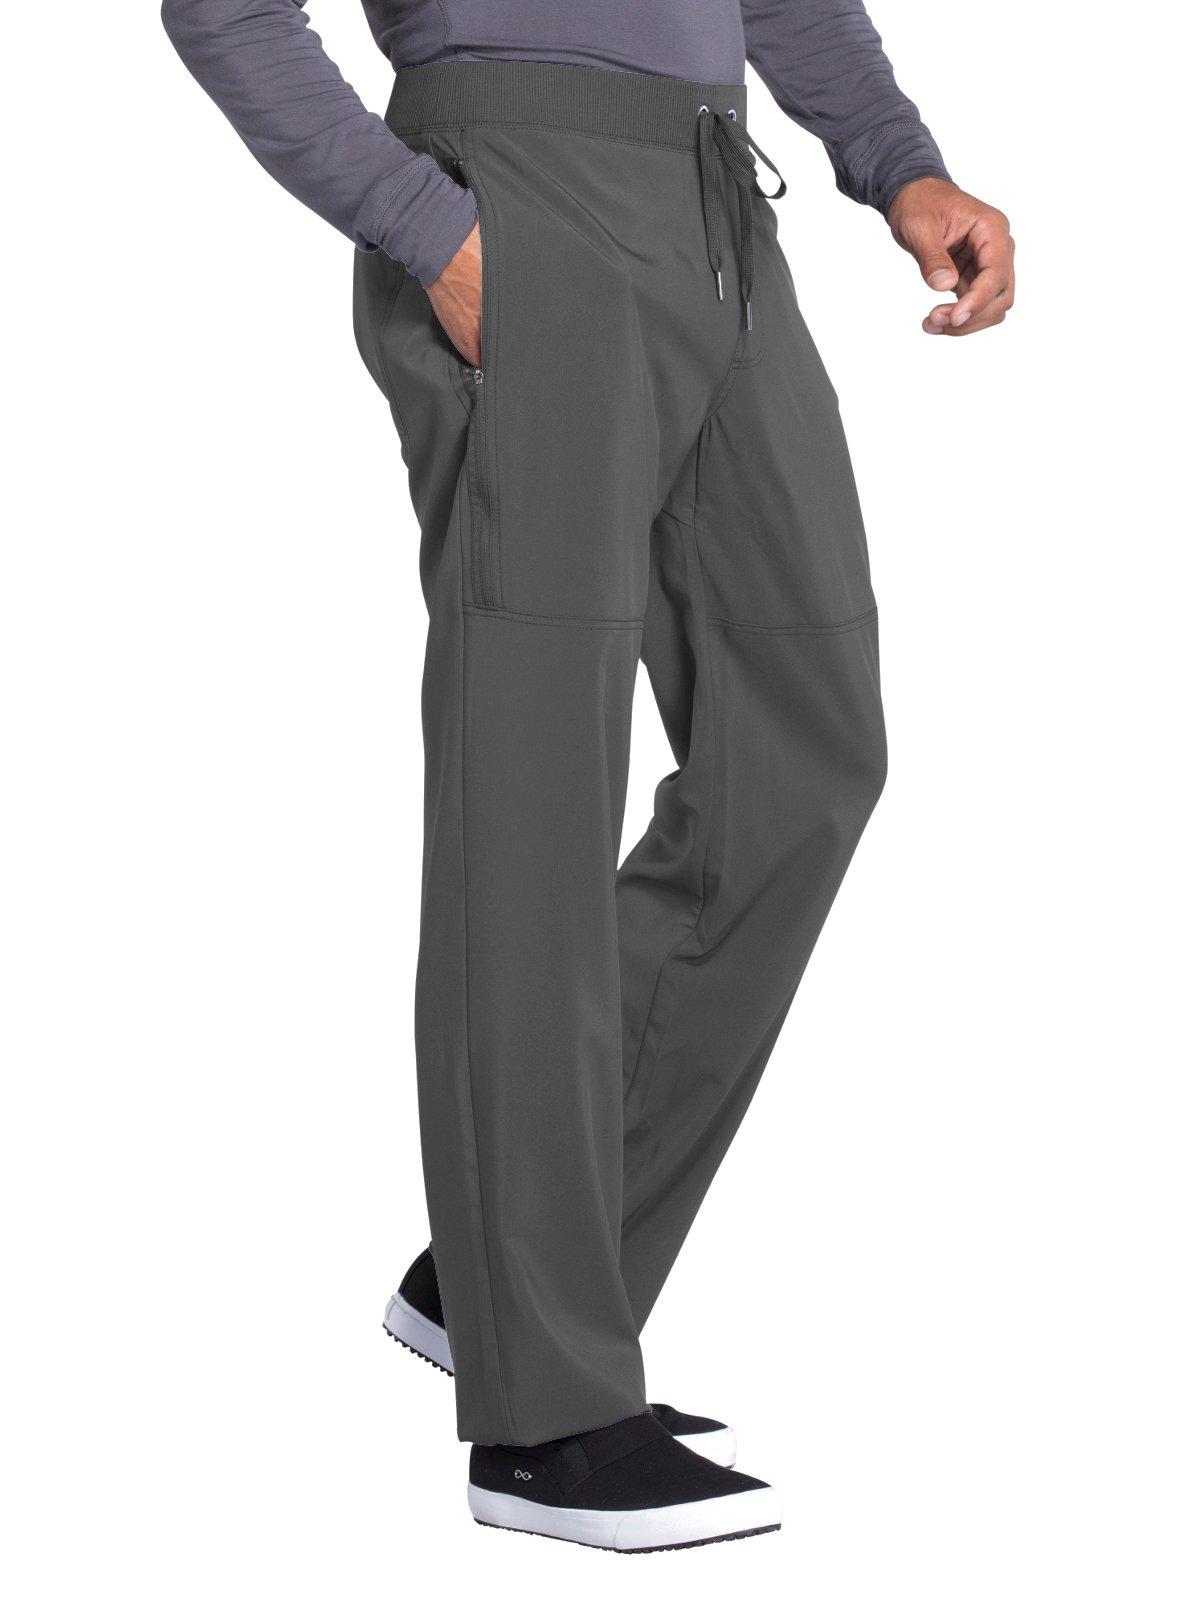 Cherokee Infinity Men's Tapered Leg Knit Waistband Drawstring Scrub Pant X-Large Tall Pewter